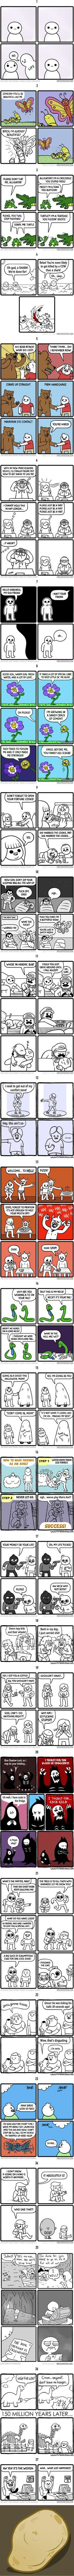 27 Brutally Hilarious Comics For People Who Like Dark Humour - 9GAG